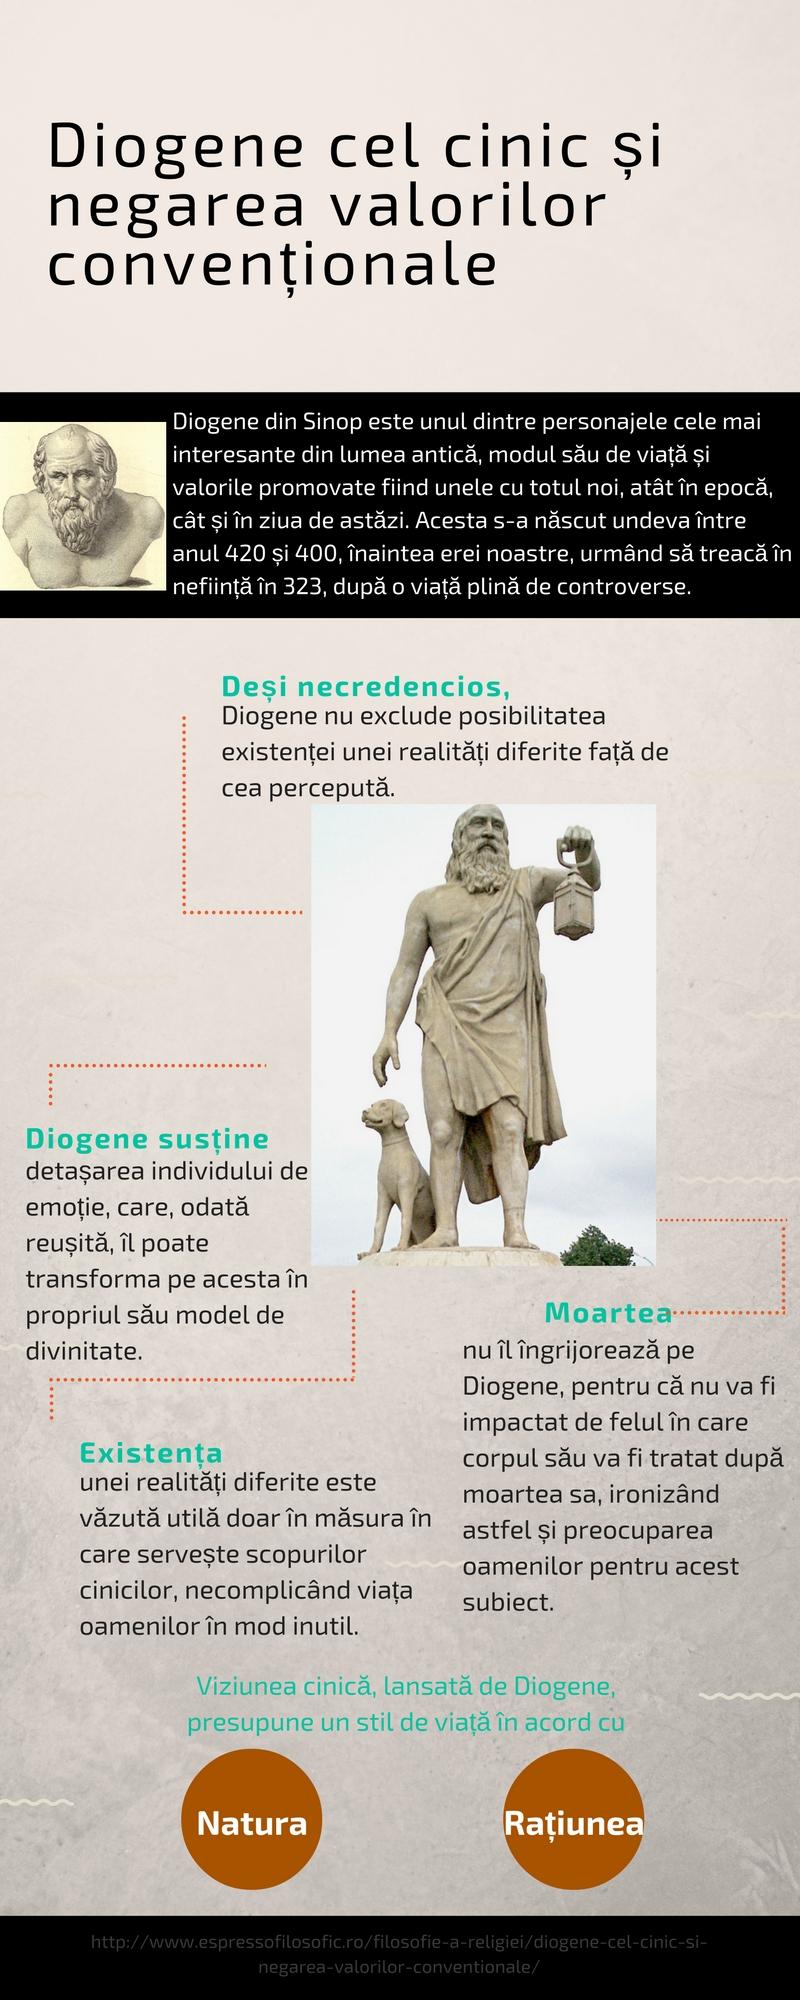 Diogene, filosofie a religiei, filosofie